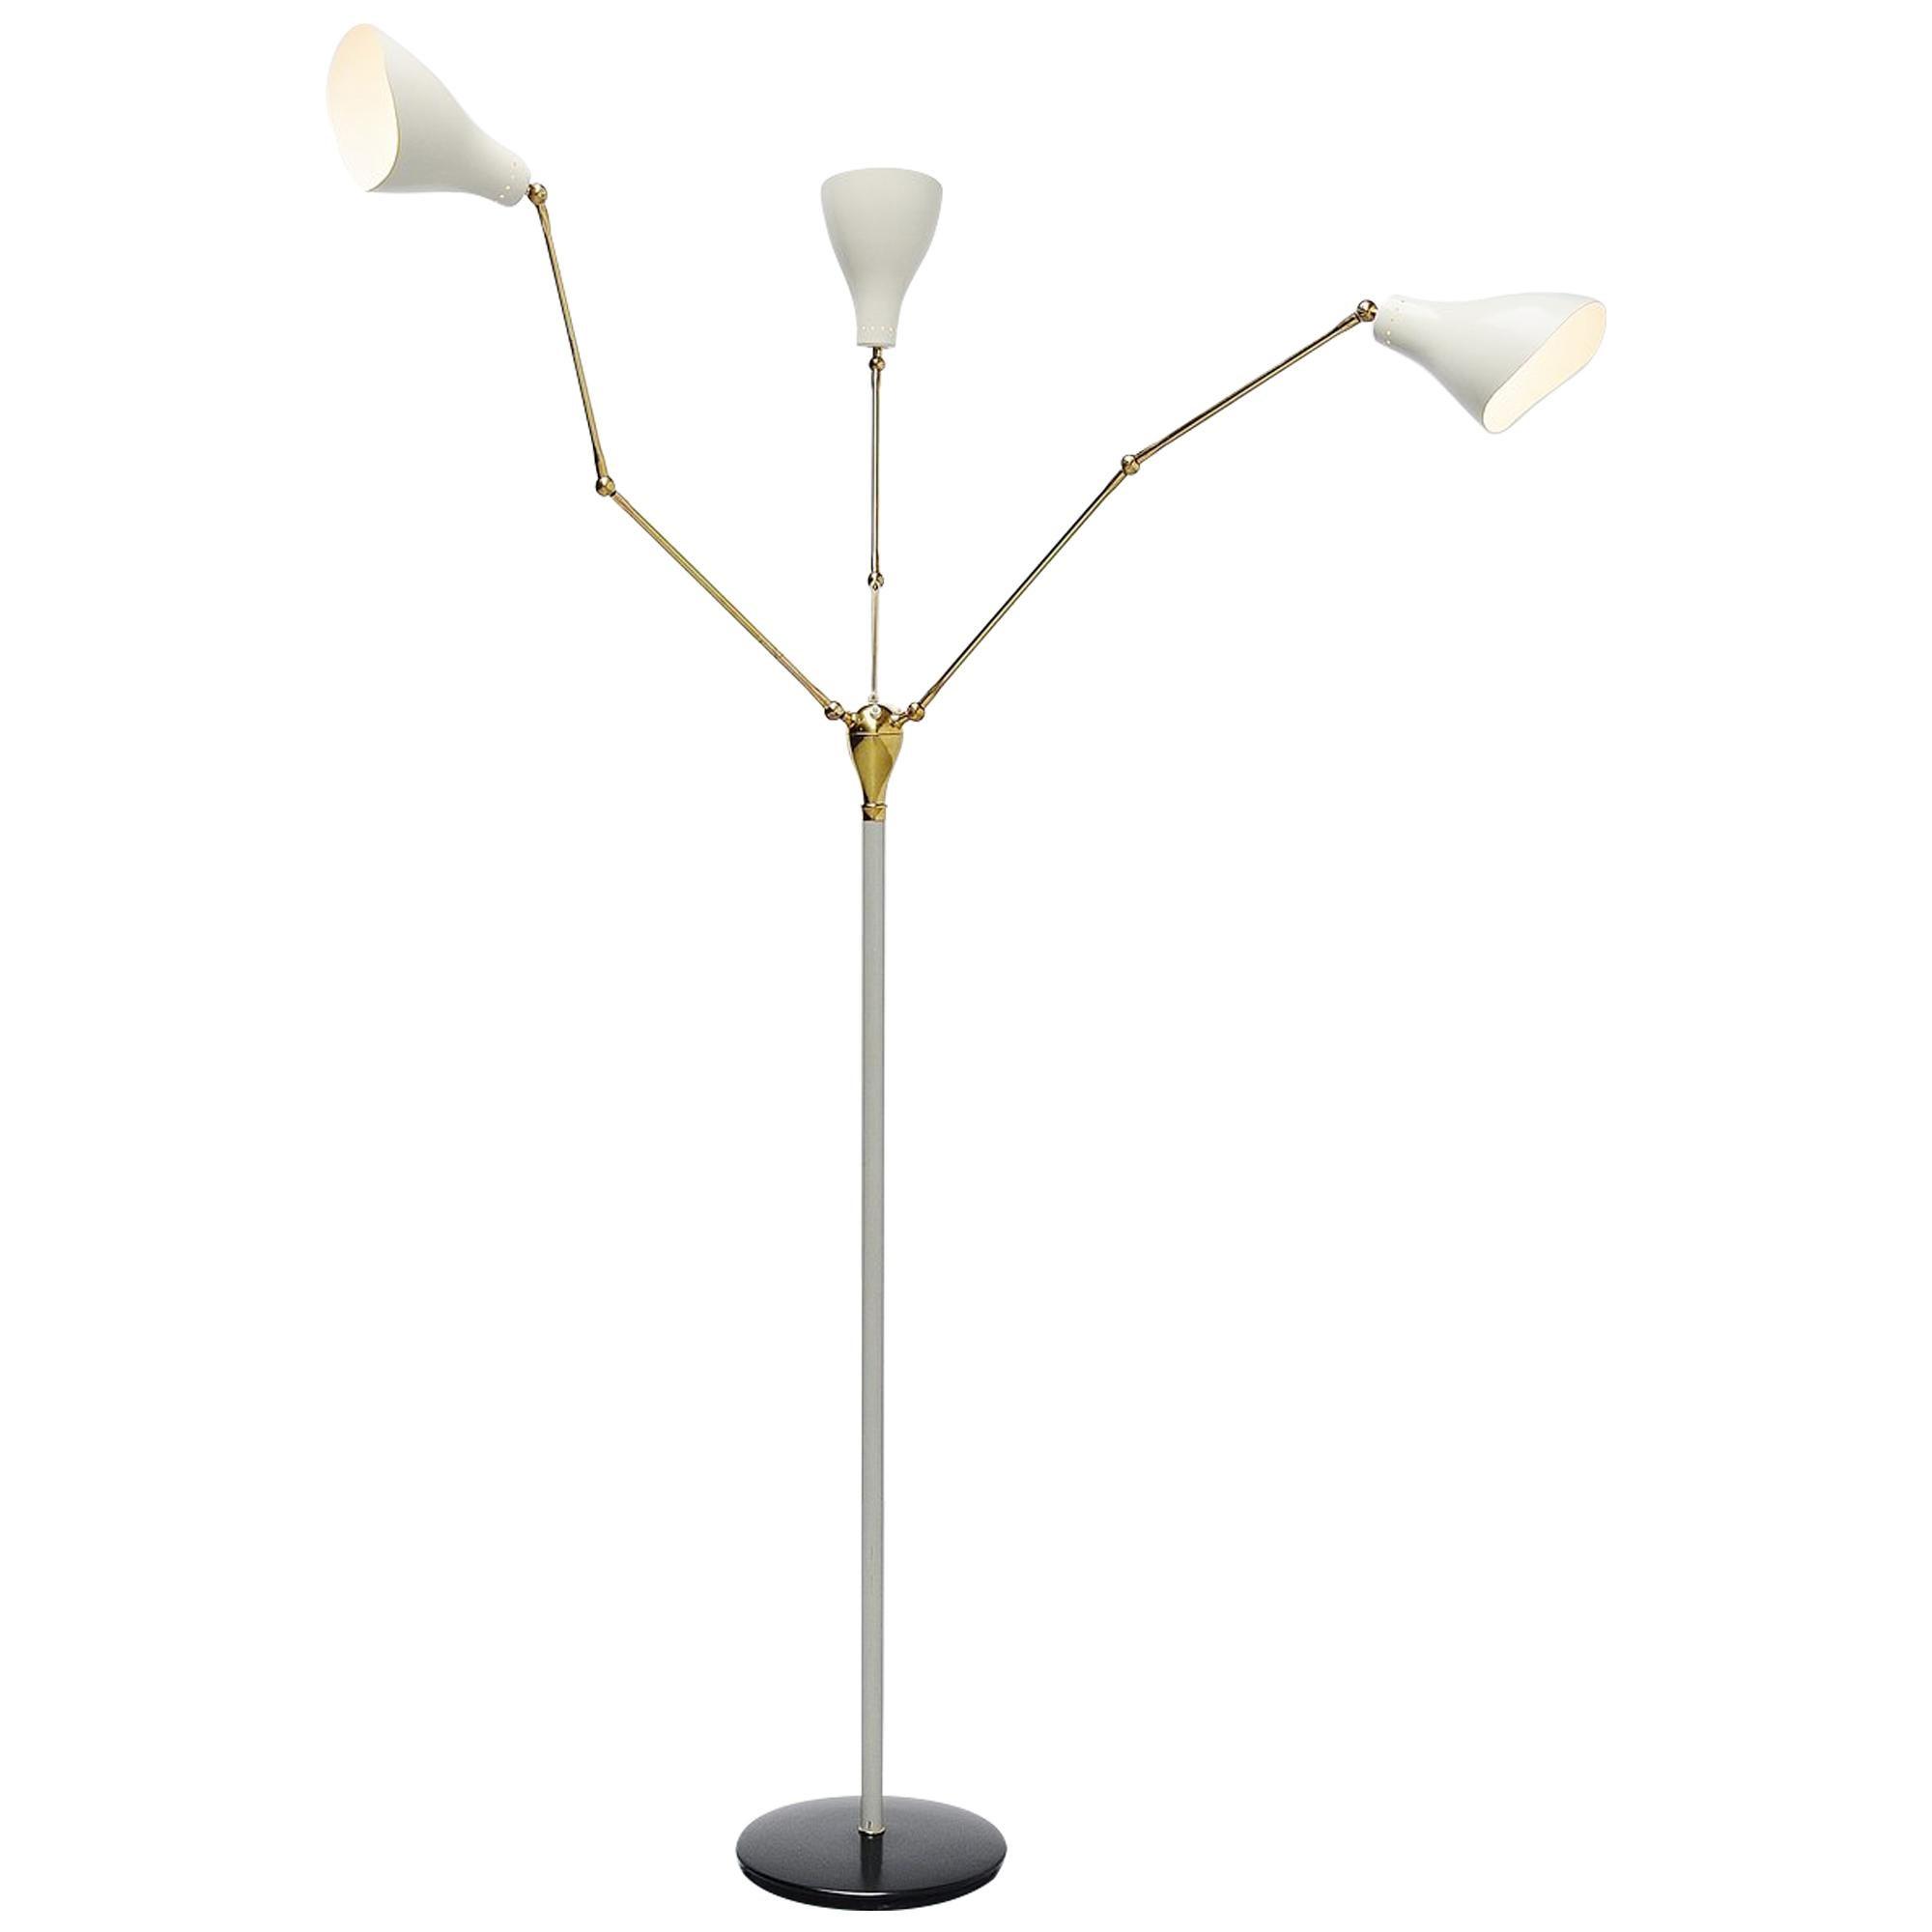 Angelo Lelli Arredoluce Floor Lamp, Italy, 1950